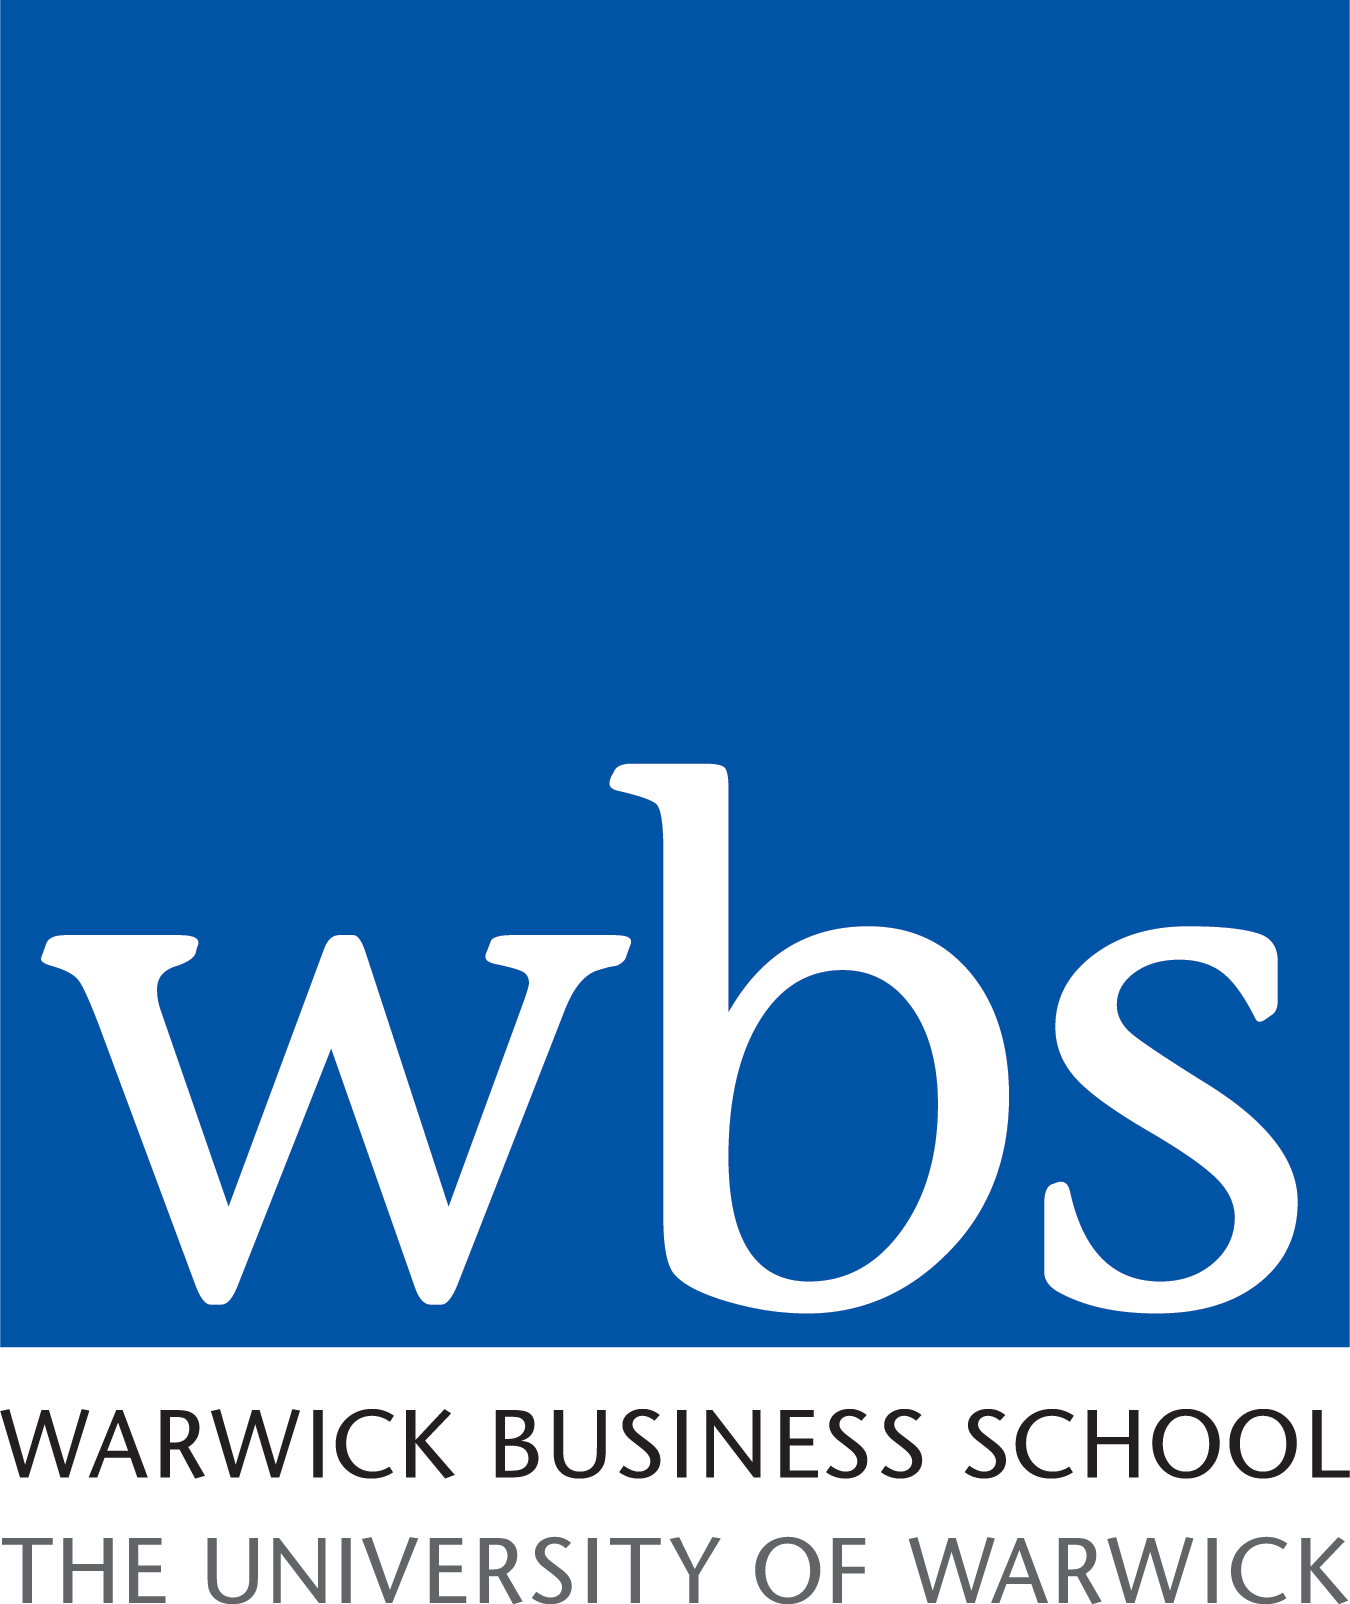 WBS-logo_University-of-Warwick_cmyk.png